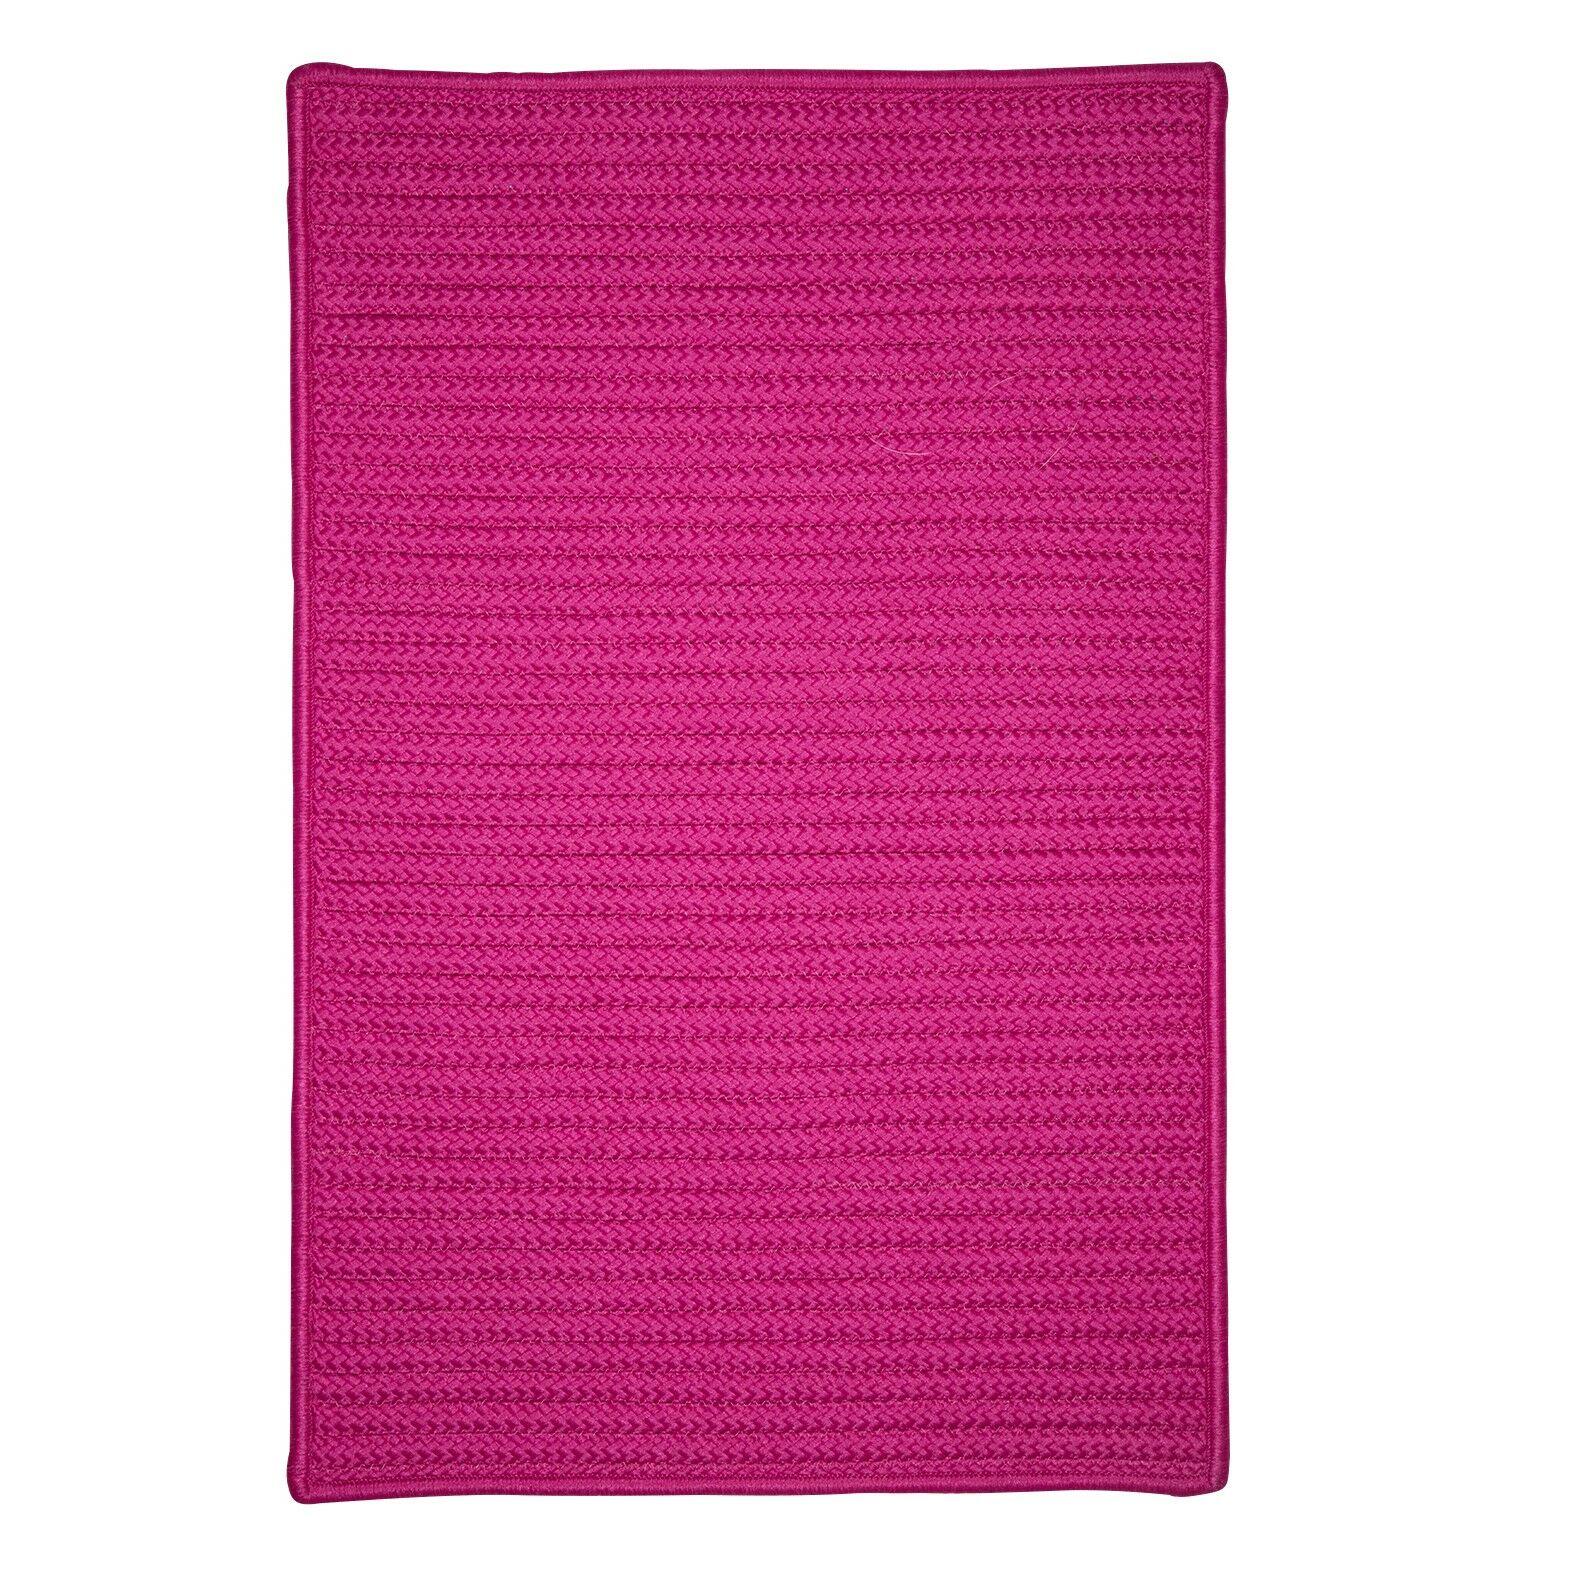 Glasgow Pink Indoor/Outdoor Area Rug Rug Size: Rectangle 12' x 15'